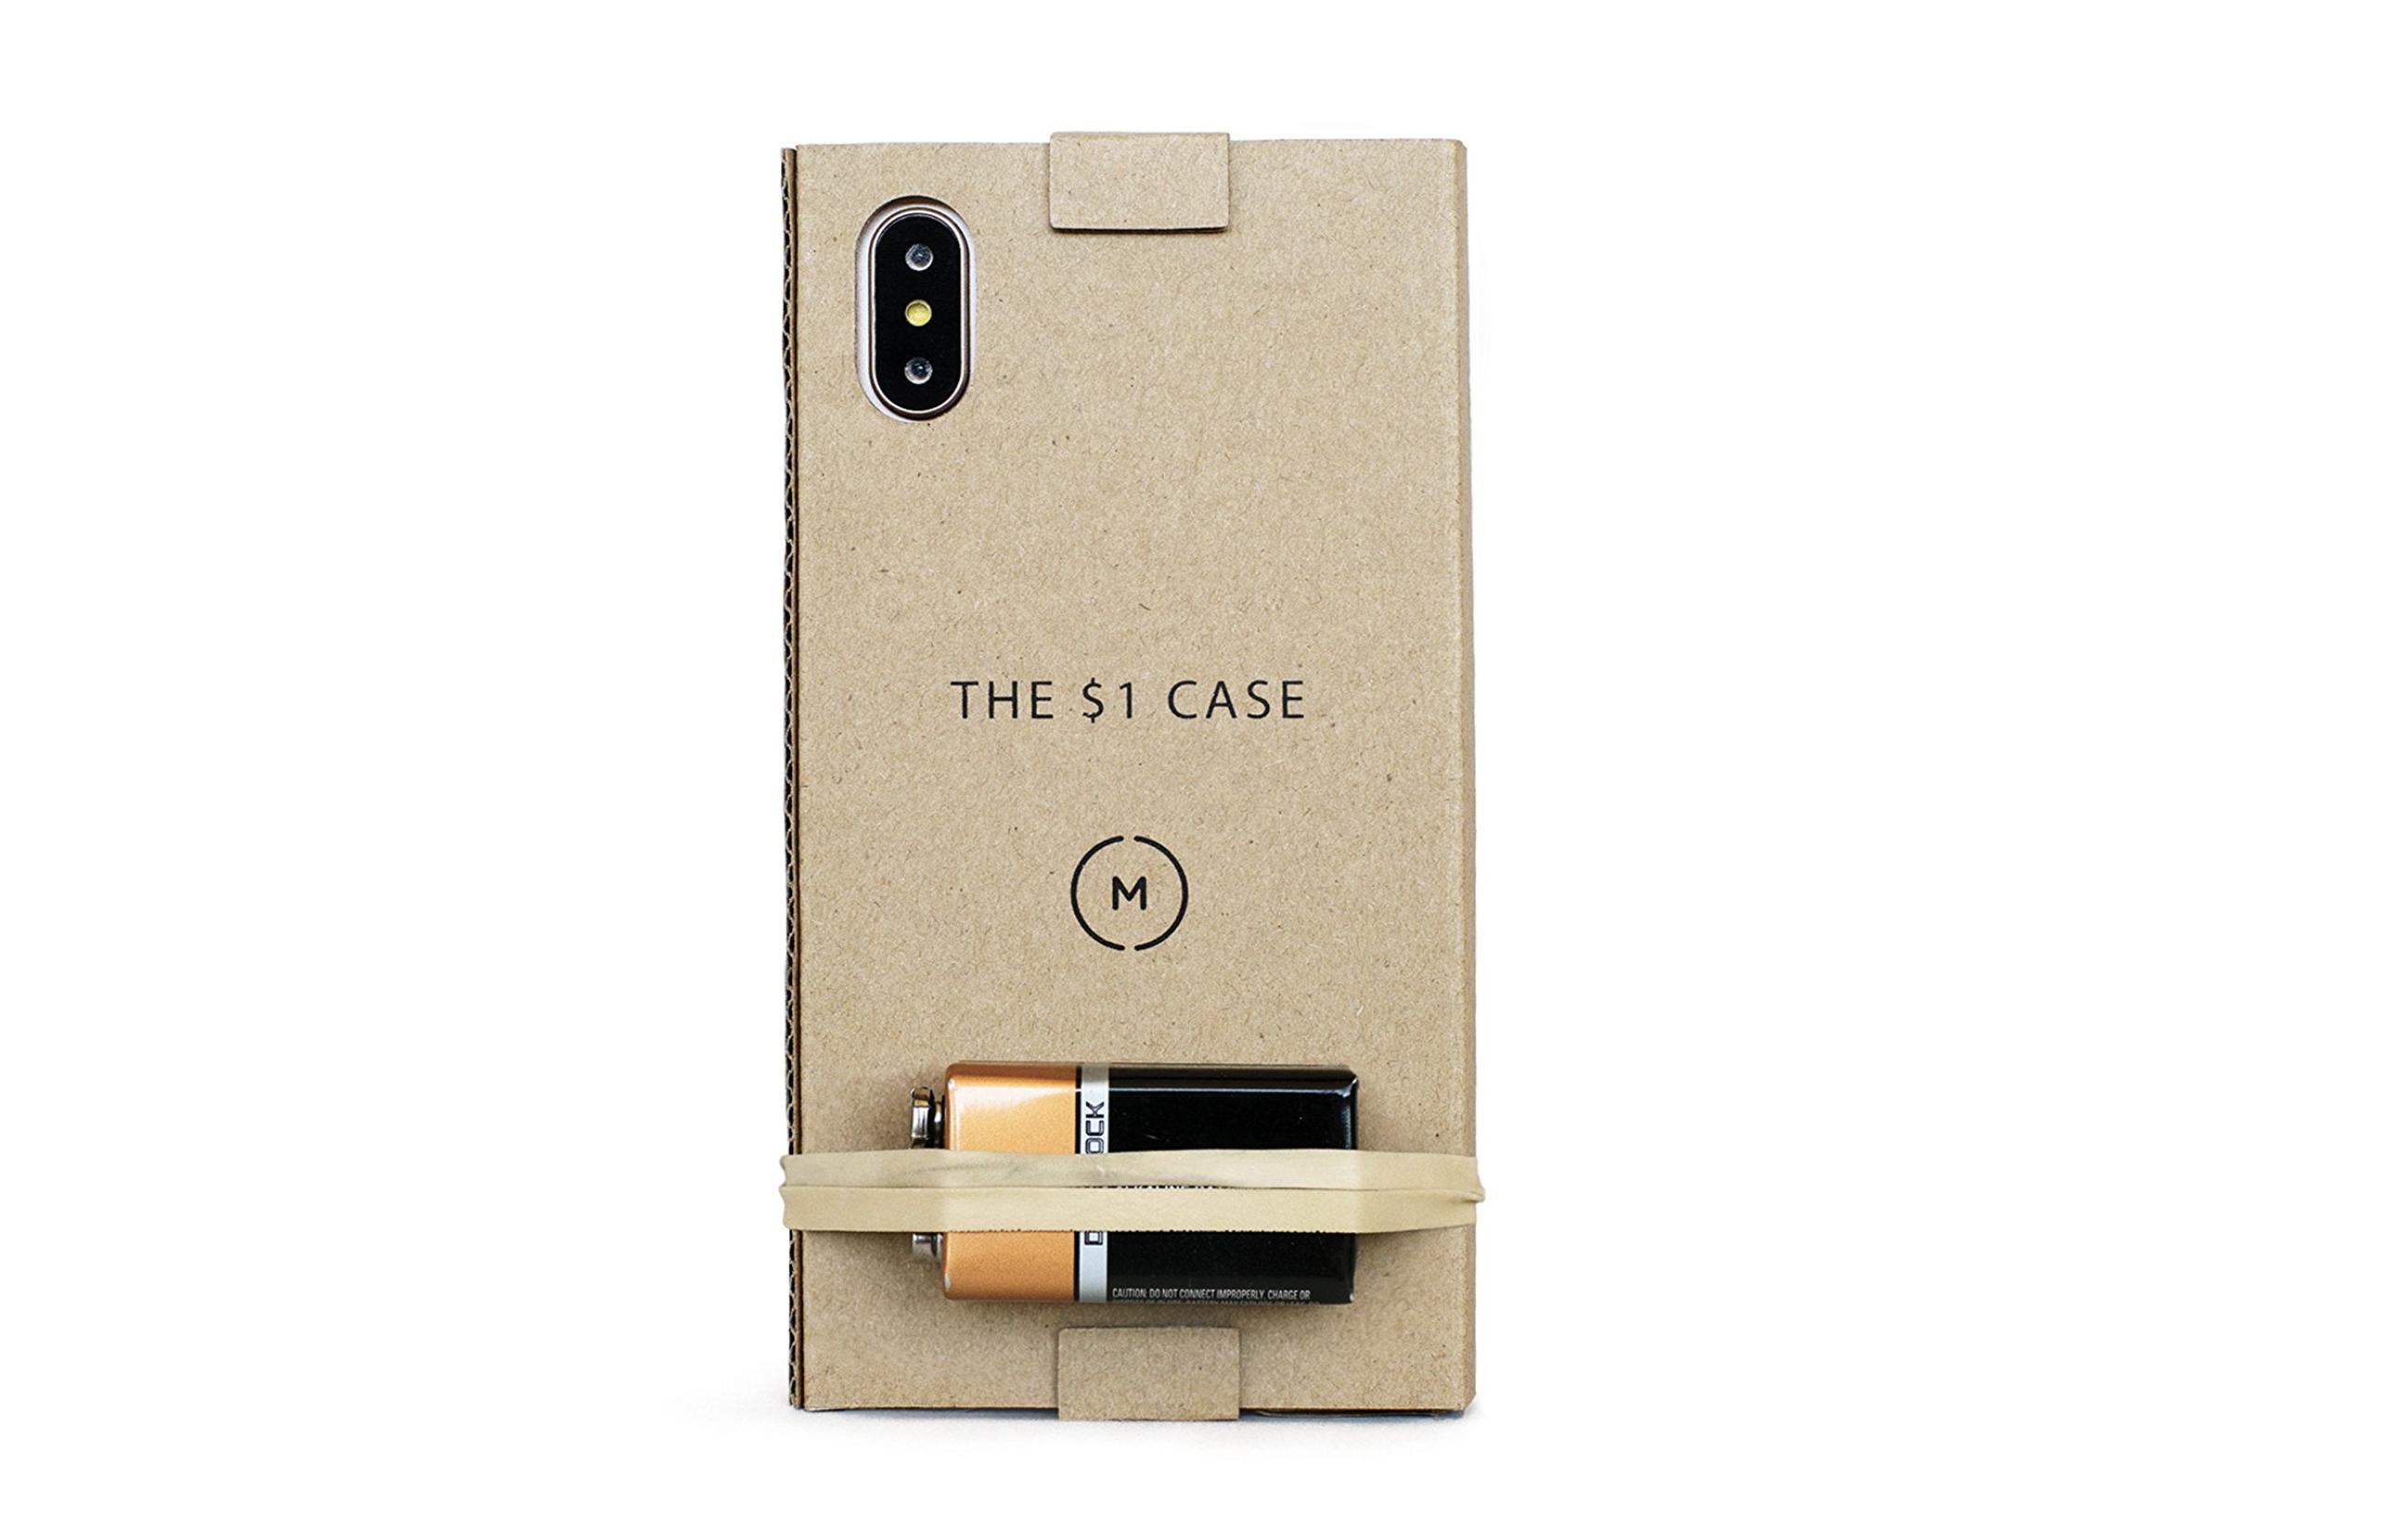 Хайповый чехол из картона для iPhone 8 и iPhone X за 1 доллар